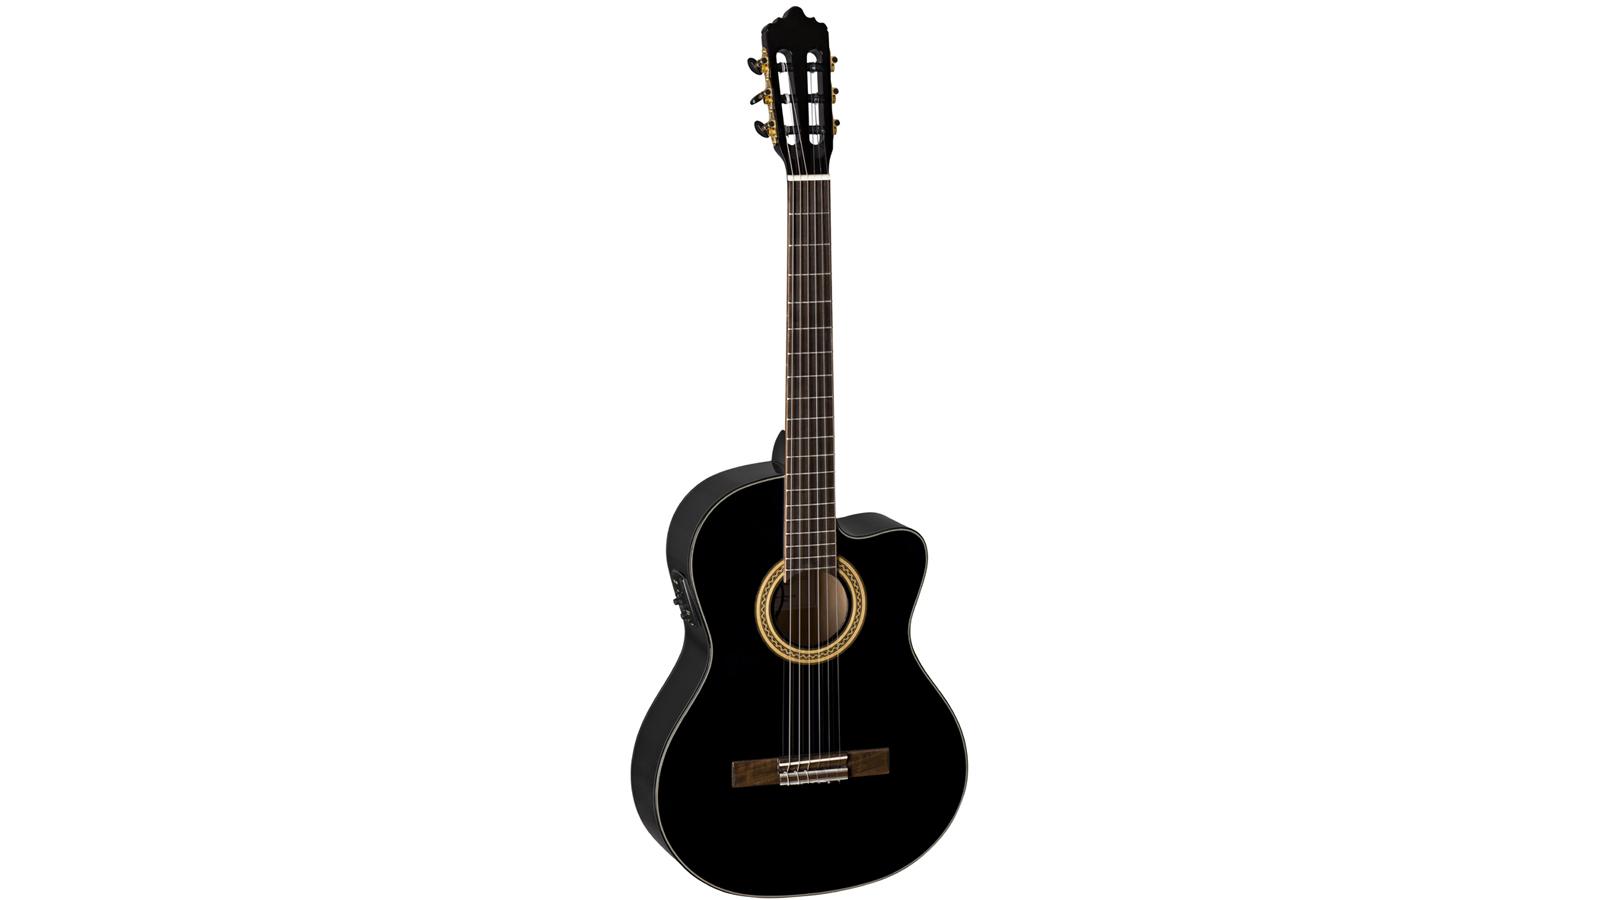 La Mancha Perla Negra-CER Klassik-Gitarre